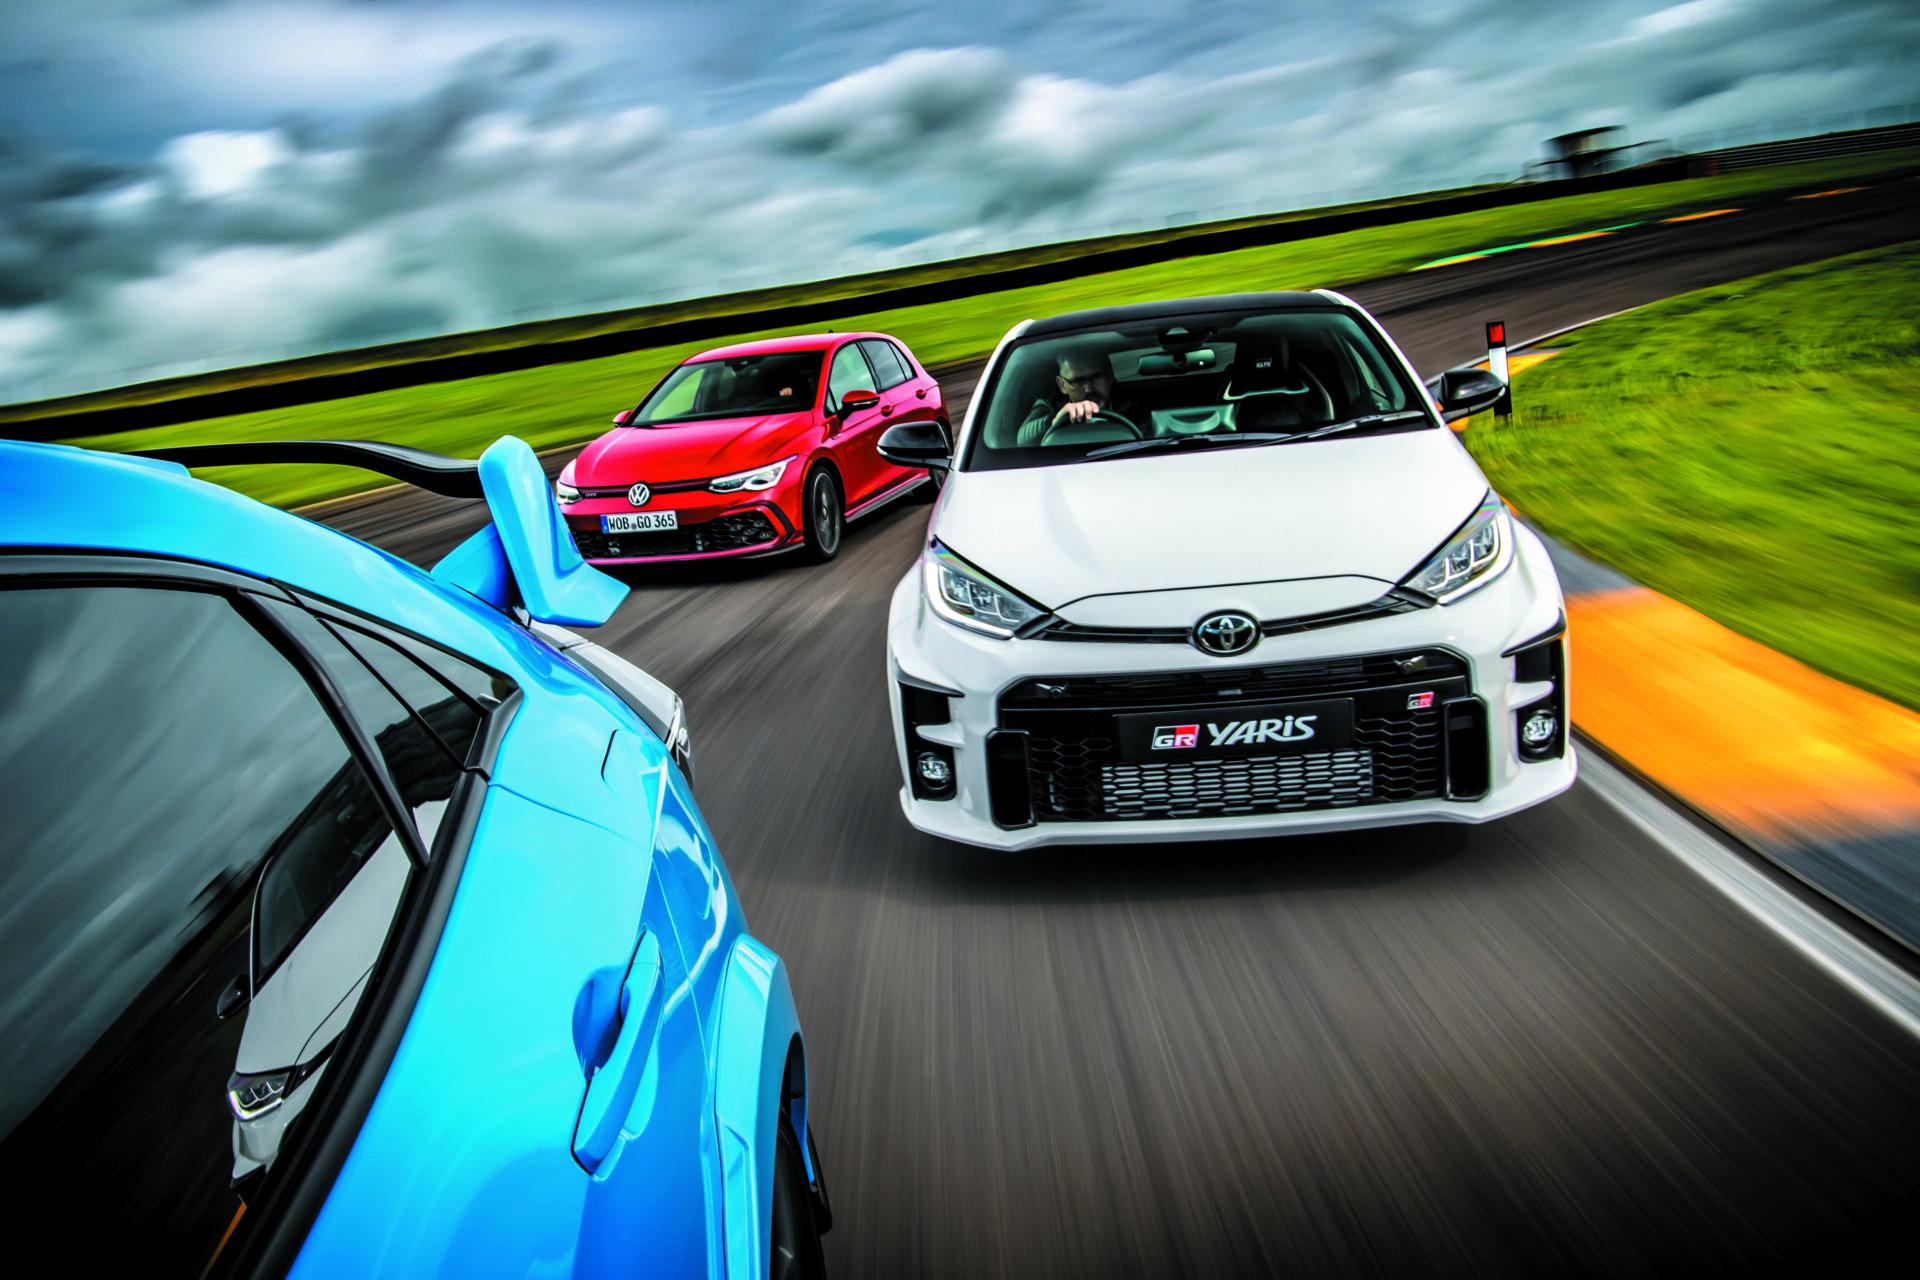 Toyota GR Yaris vs. Golf GTI vs. Honda Civic Type R